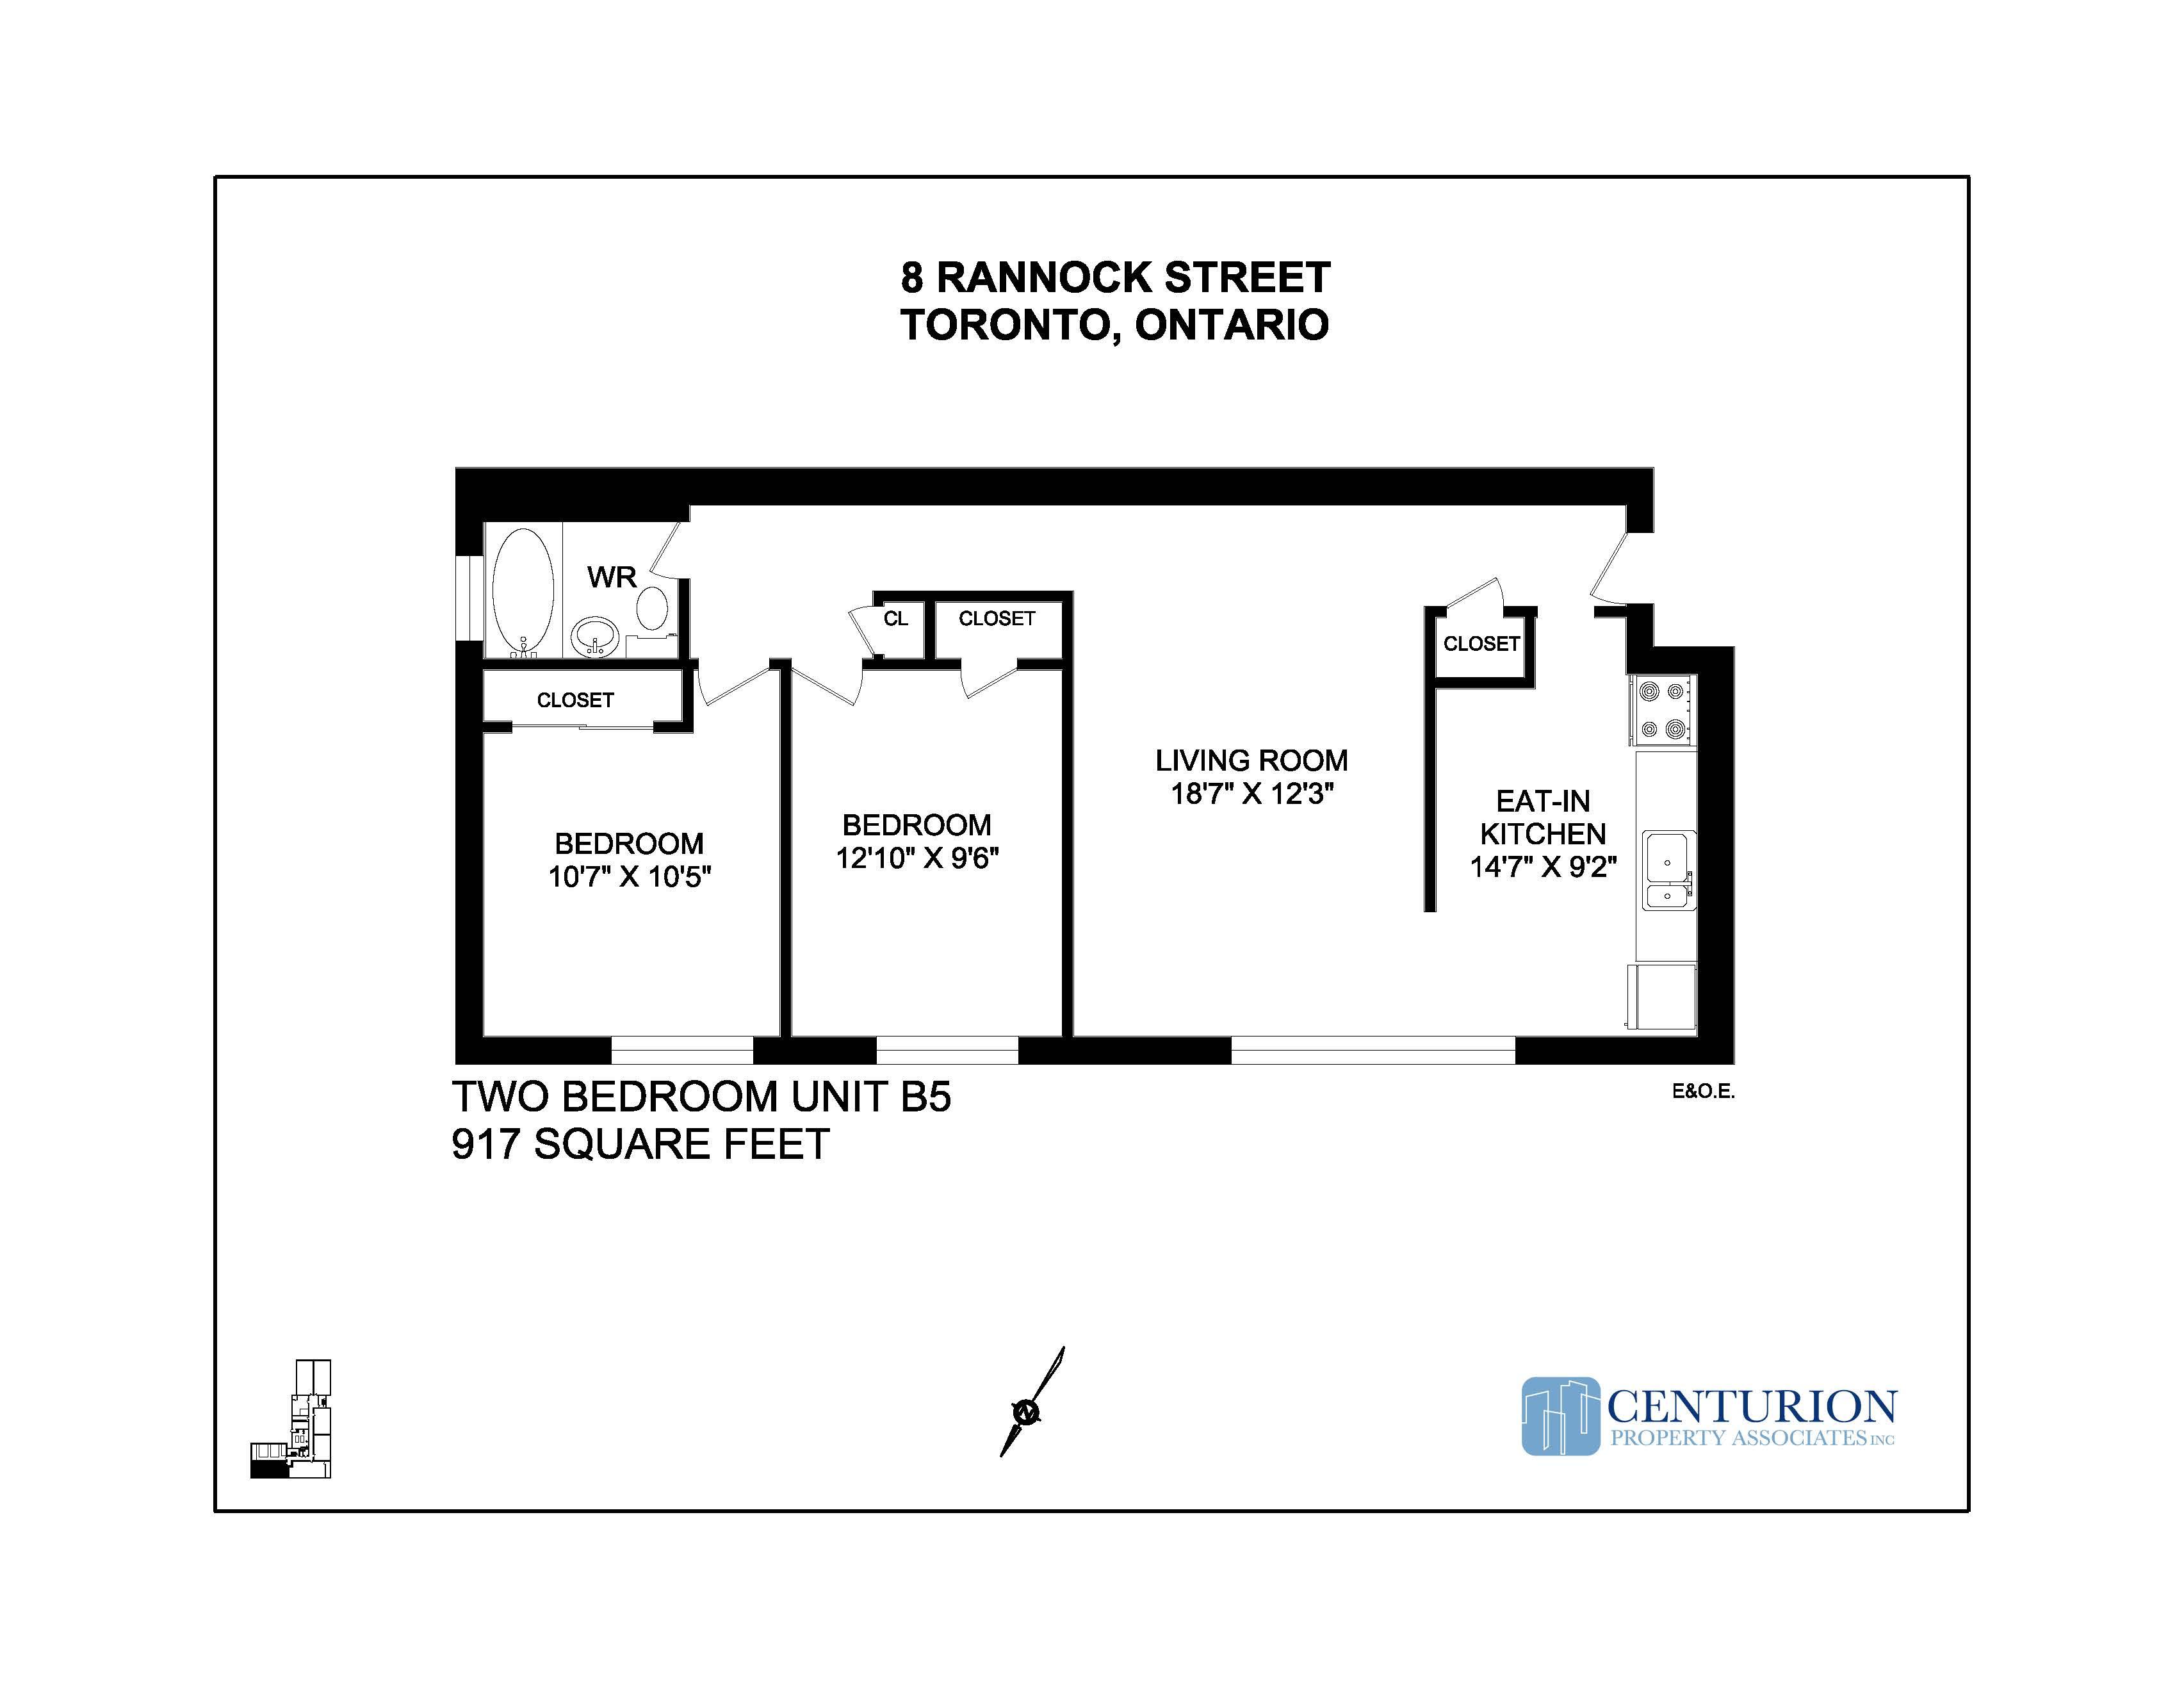 Rannock & Pharmacy Apartments   Centurion Property Management